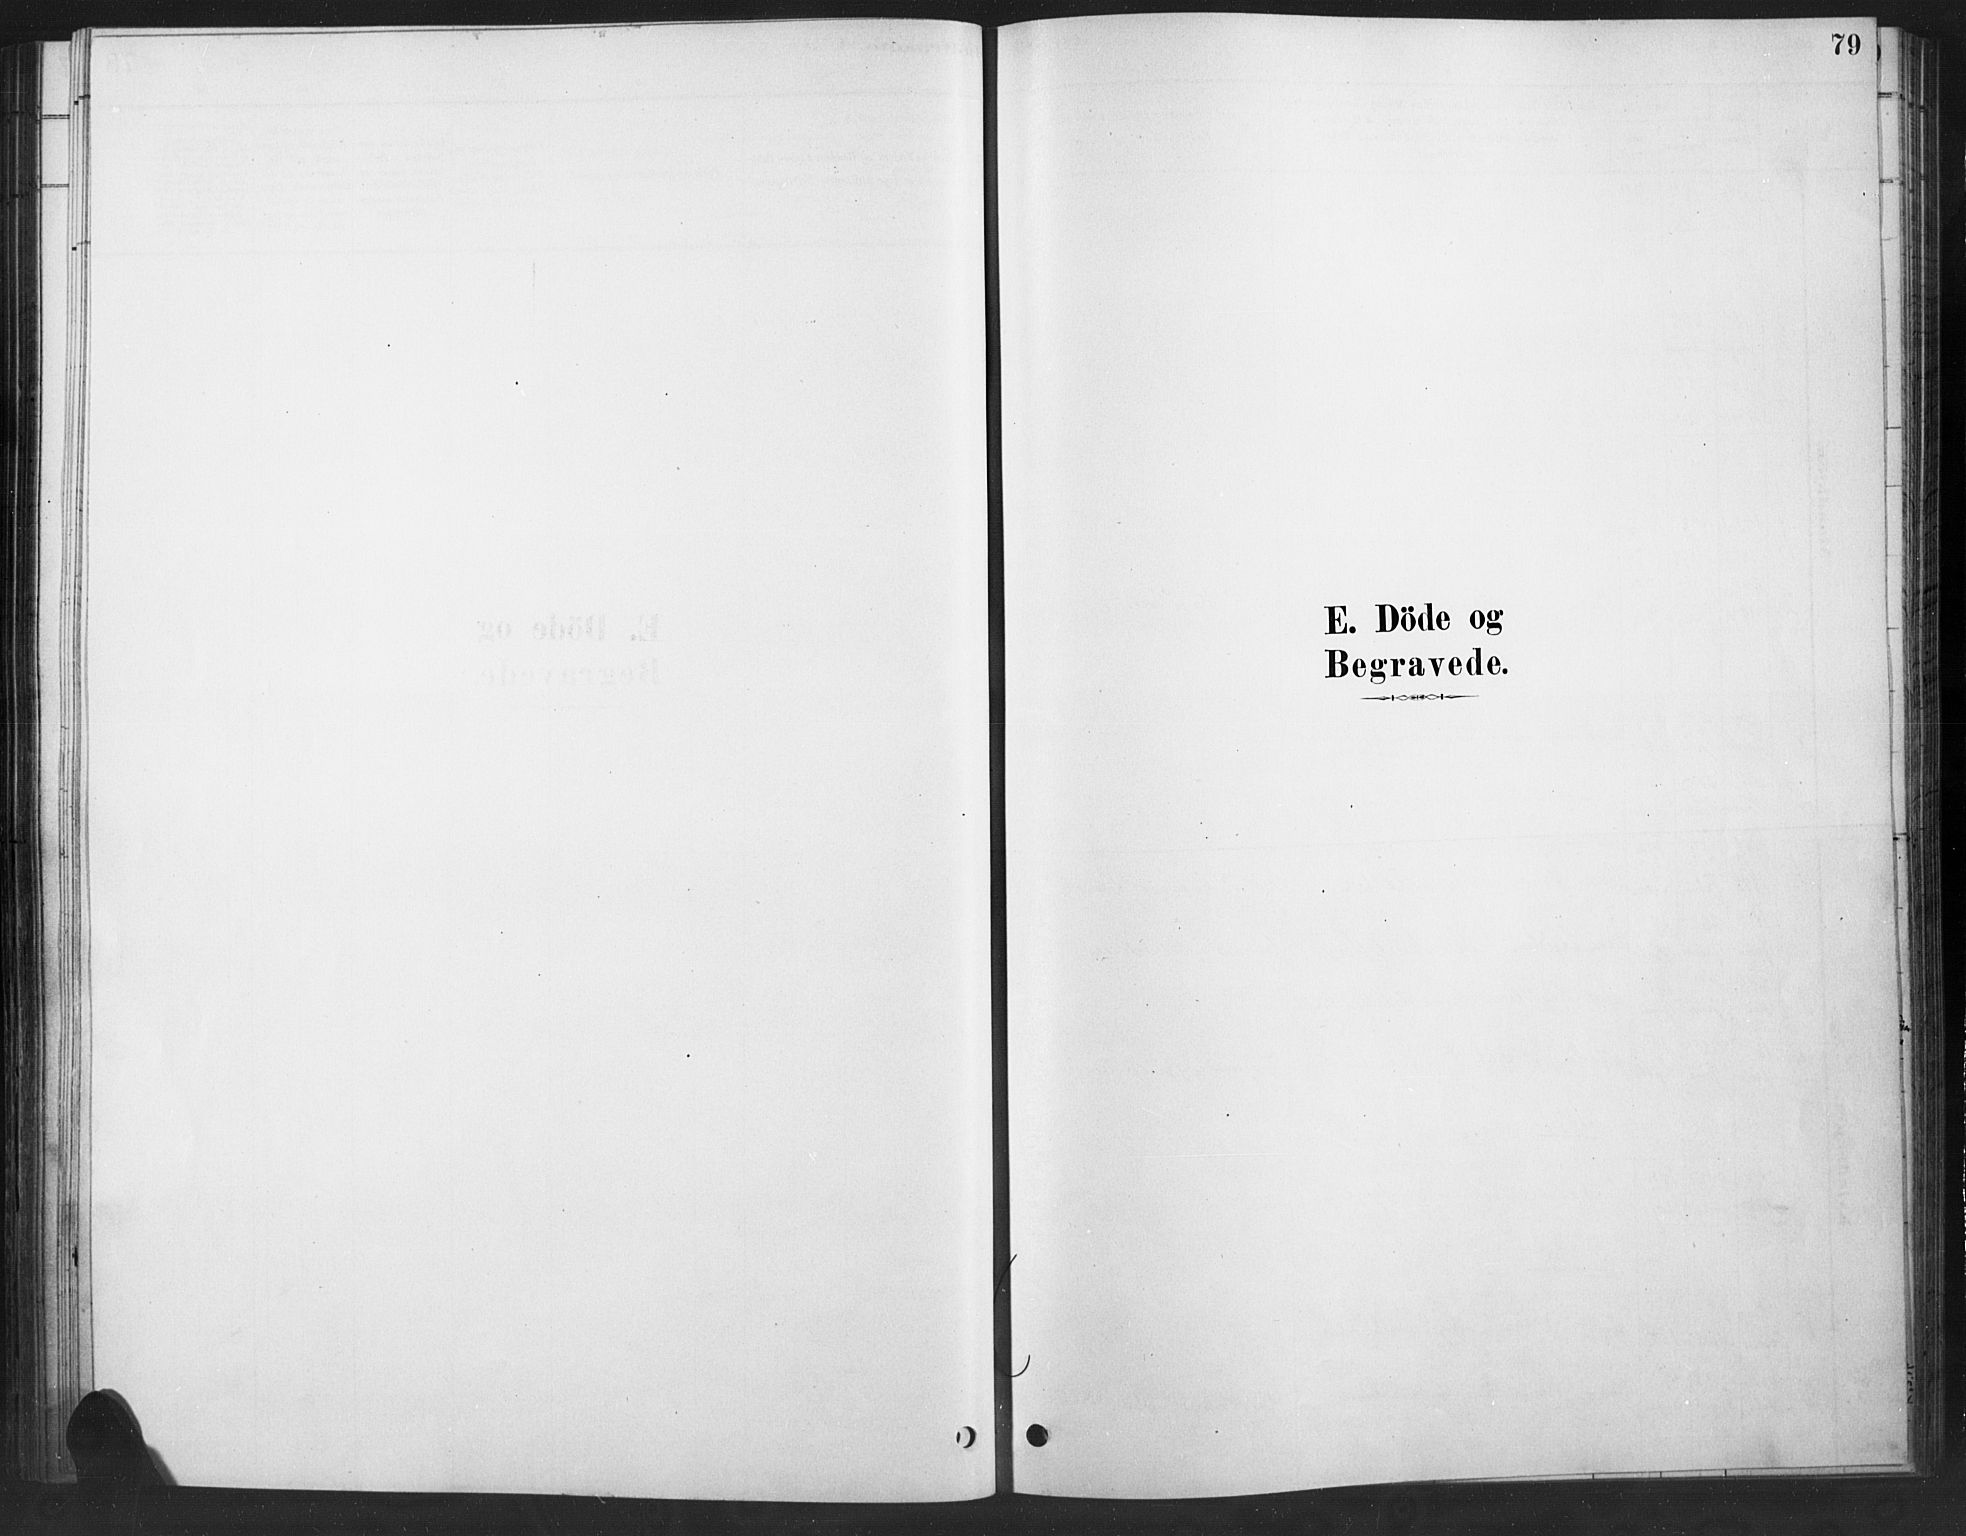 SAH, Ringebu prestekontor, Ministerialbok nr. 10, 1878-1898, s. 79